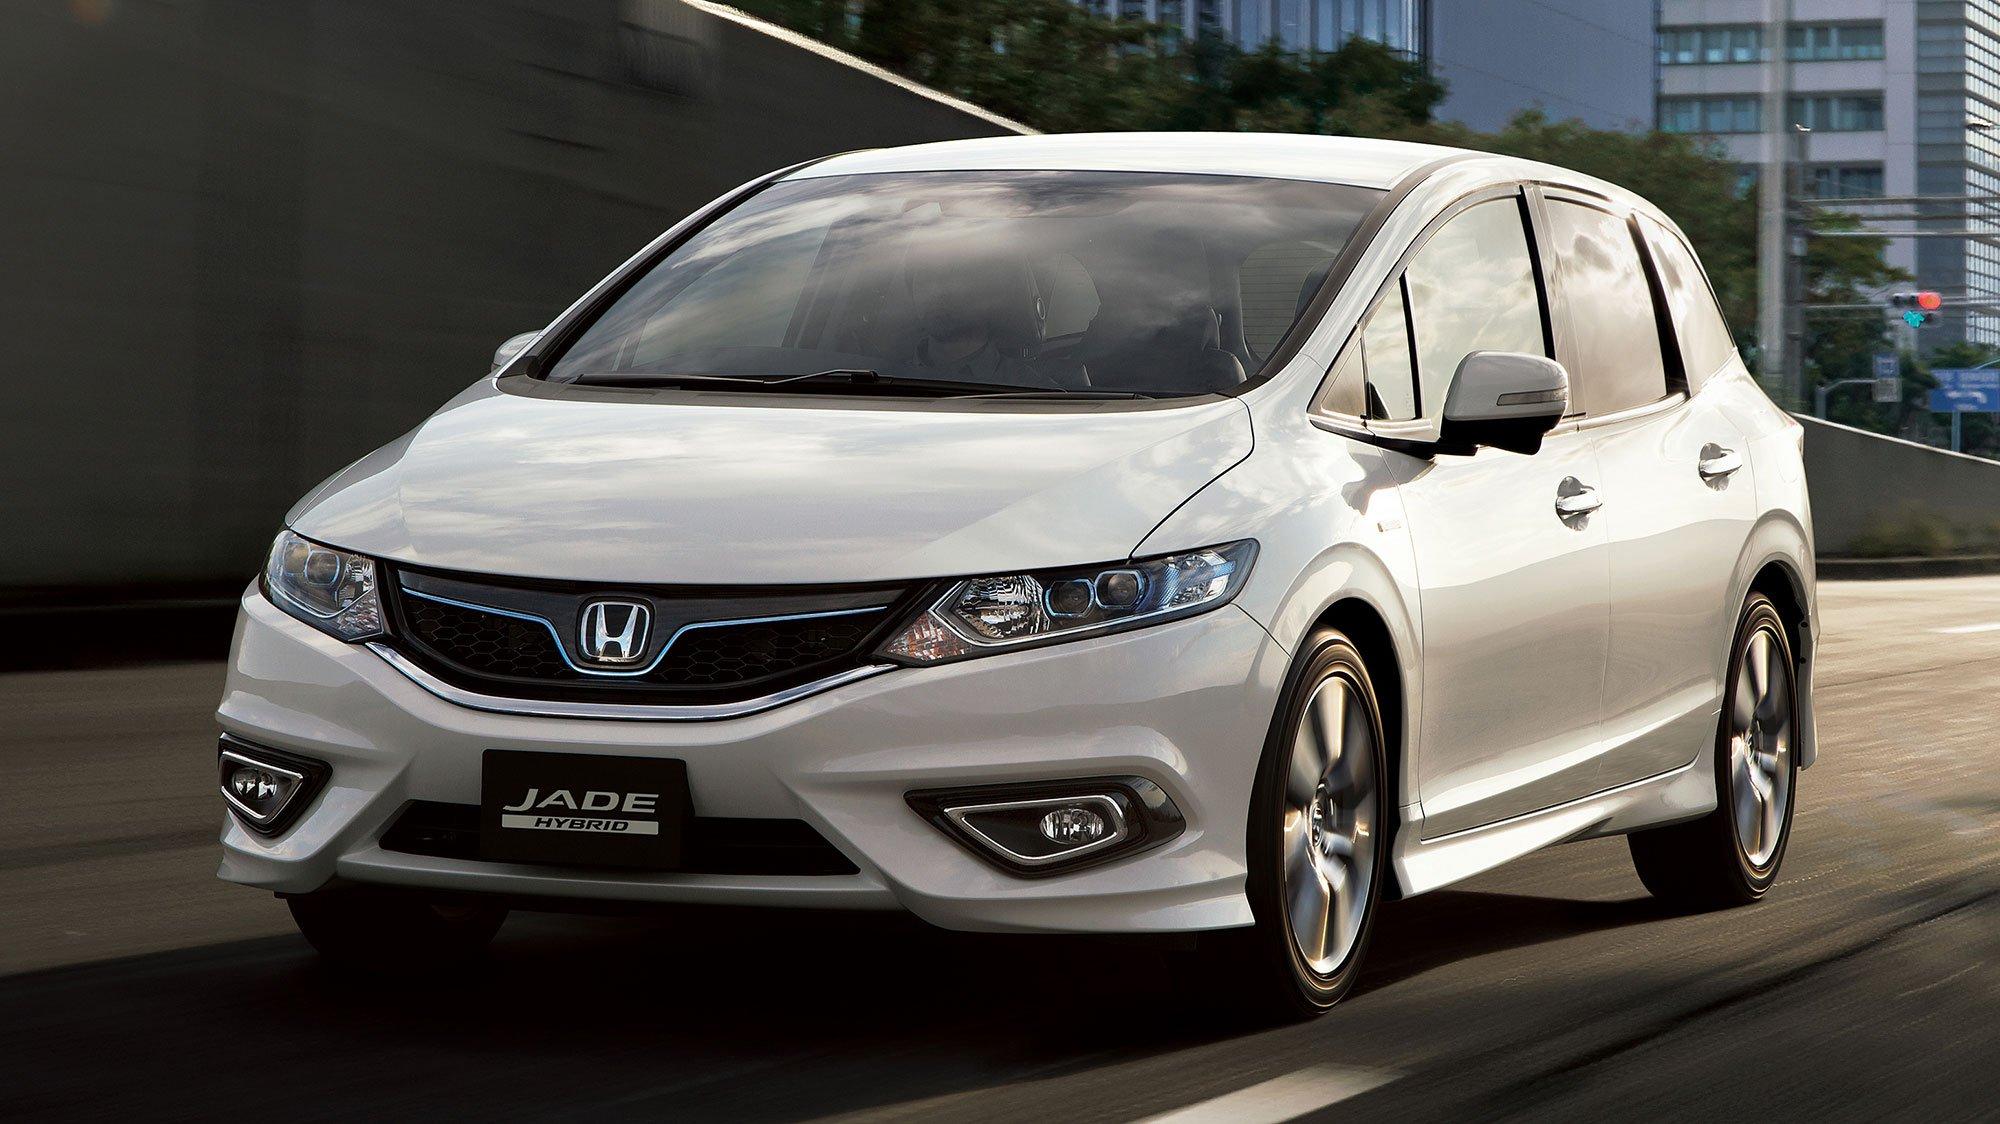 Honda Jade Hybrid - six-seater MPV launching in Japan